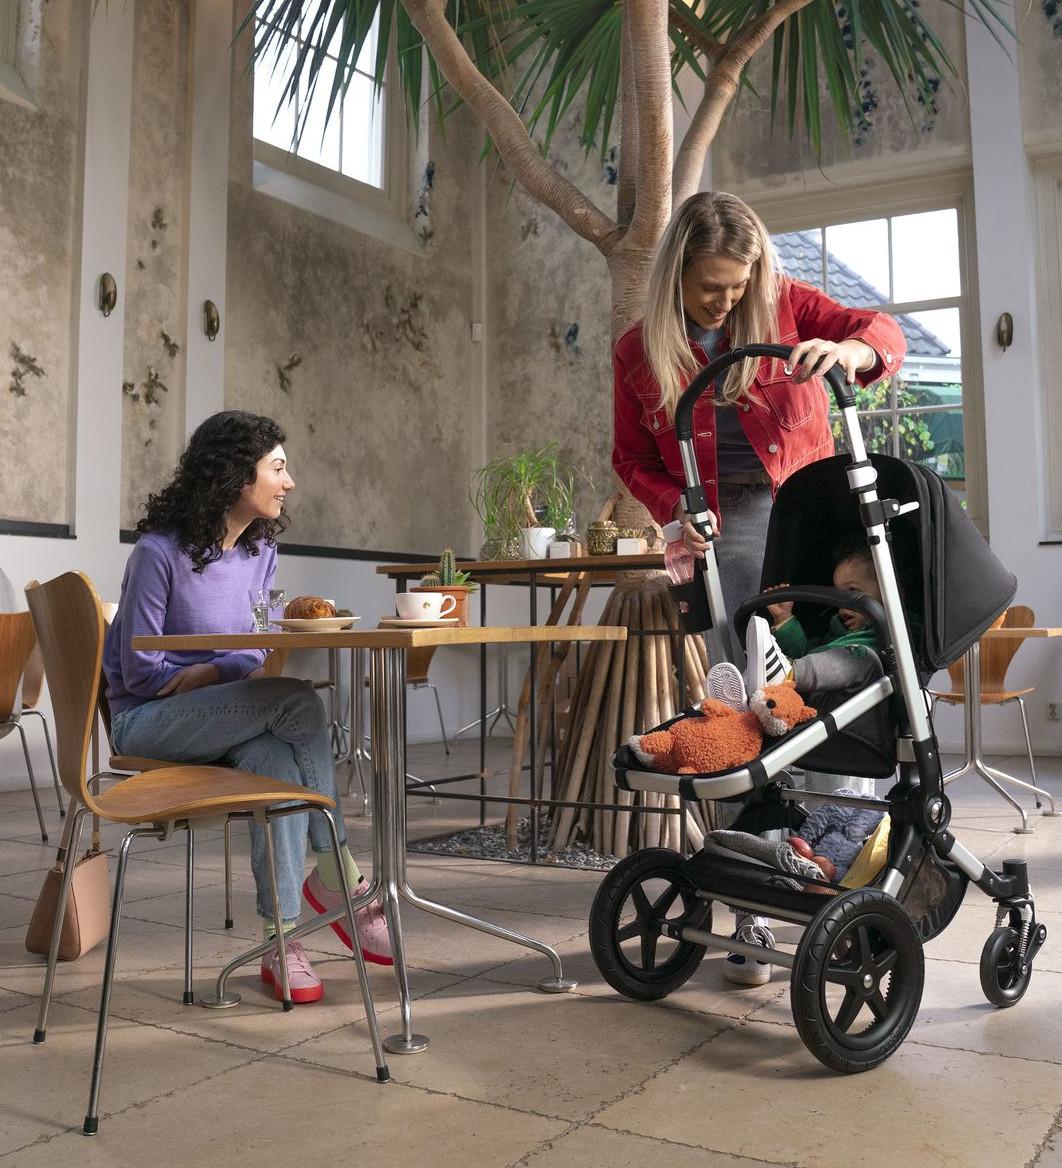 Bugaboo Cameleon Kinderwagen Set in Berlin kaufen - Kleine Fabriek